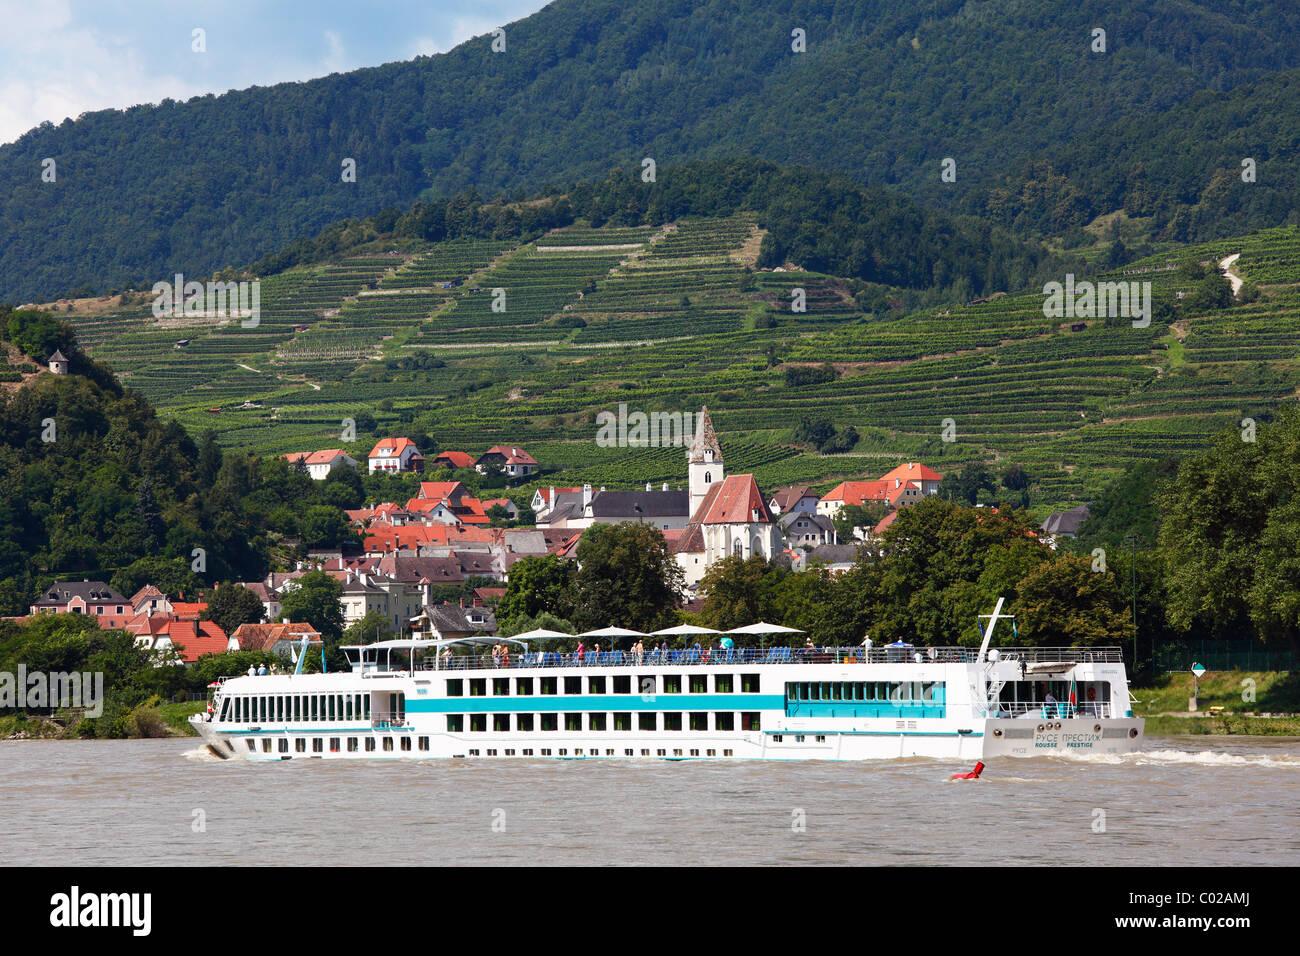 MS Rousse Prestige cruise ship on the Danube, Spitz, Wachau, Waldviertel quarter, Lower Austria, Austria, Europe - Stock Image